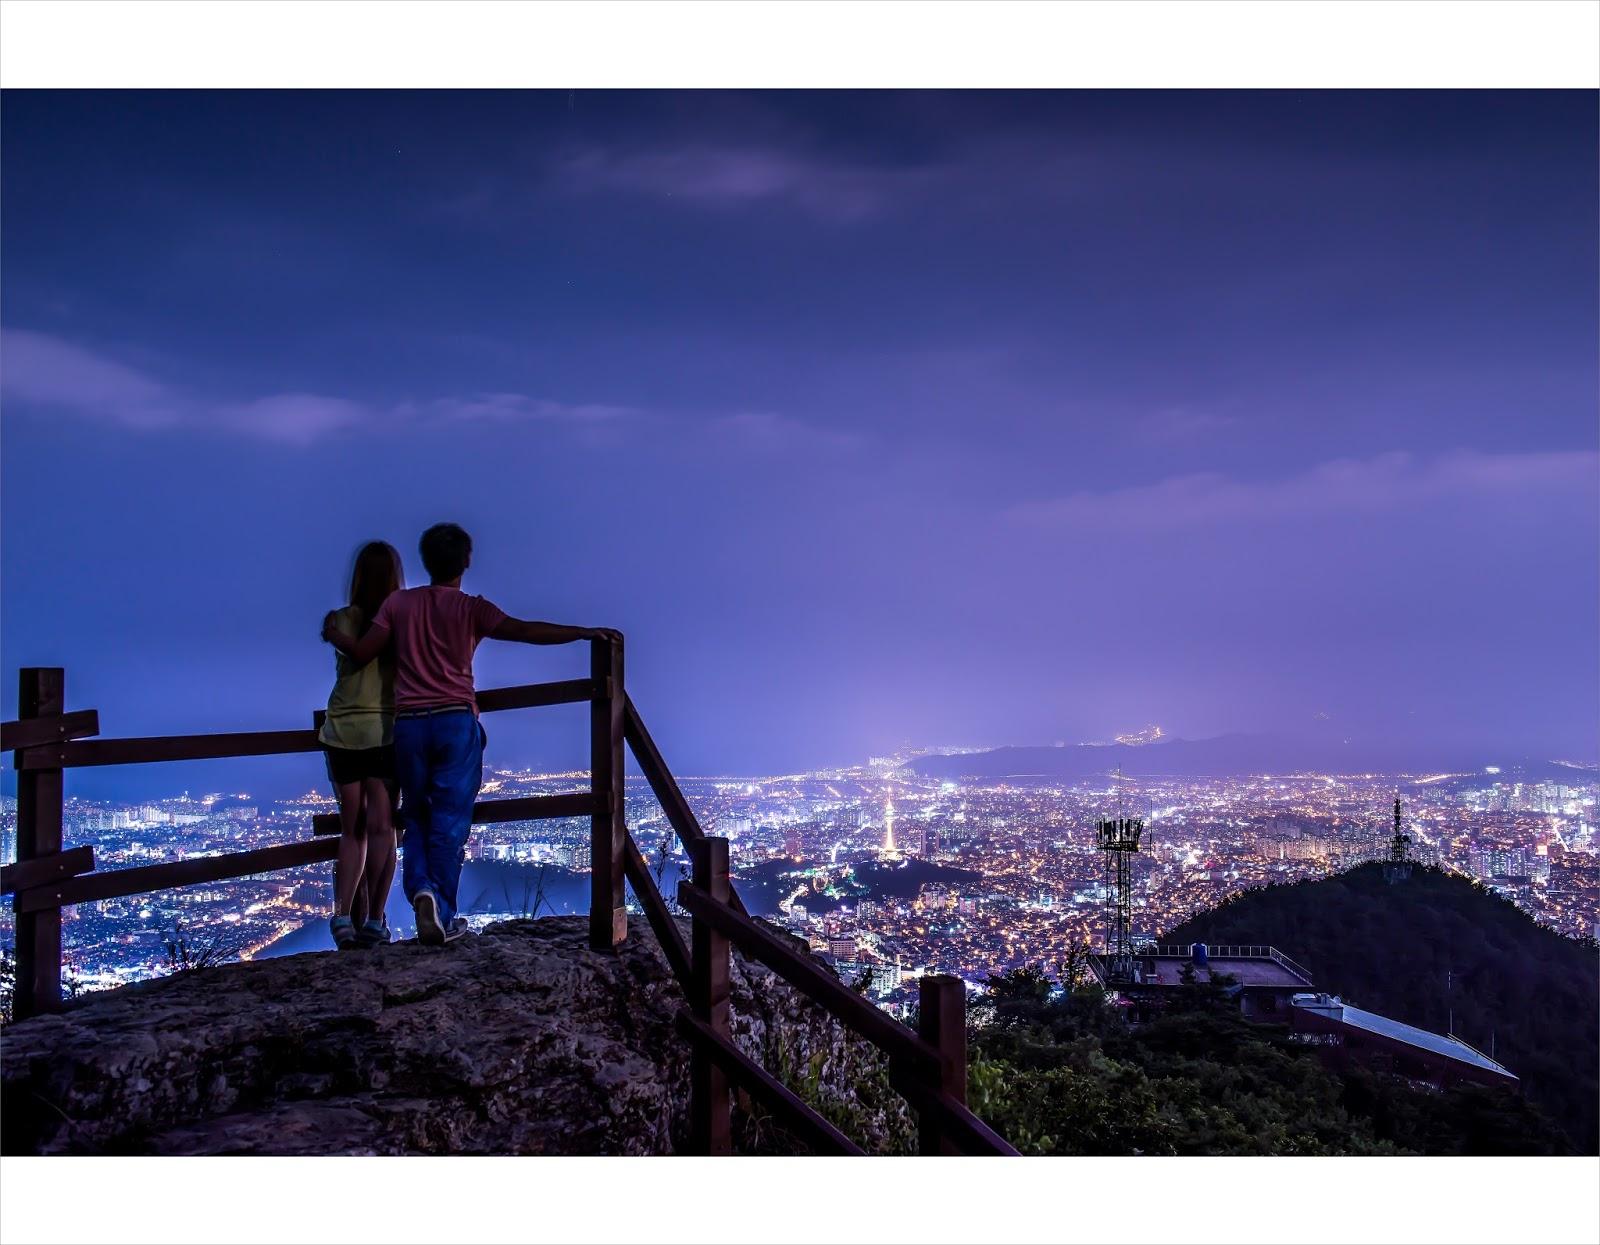 Fun Free Daegu Travel Top 5 Night Views Of Daegu Korea A Great Nighttime Trip In Daegu